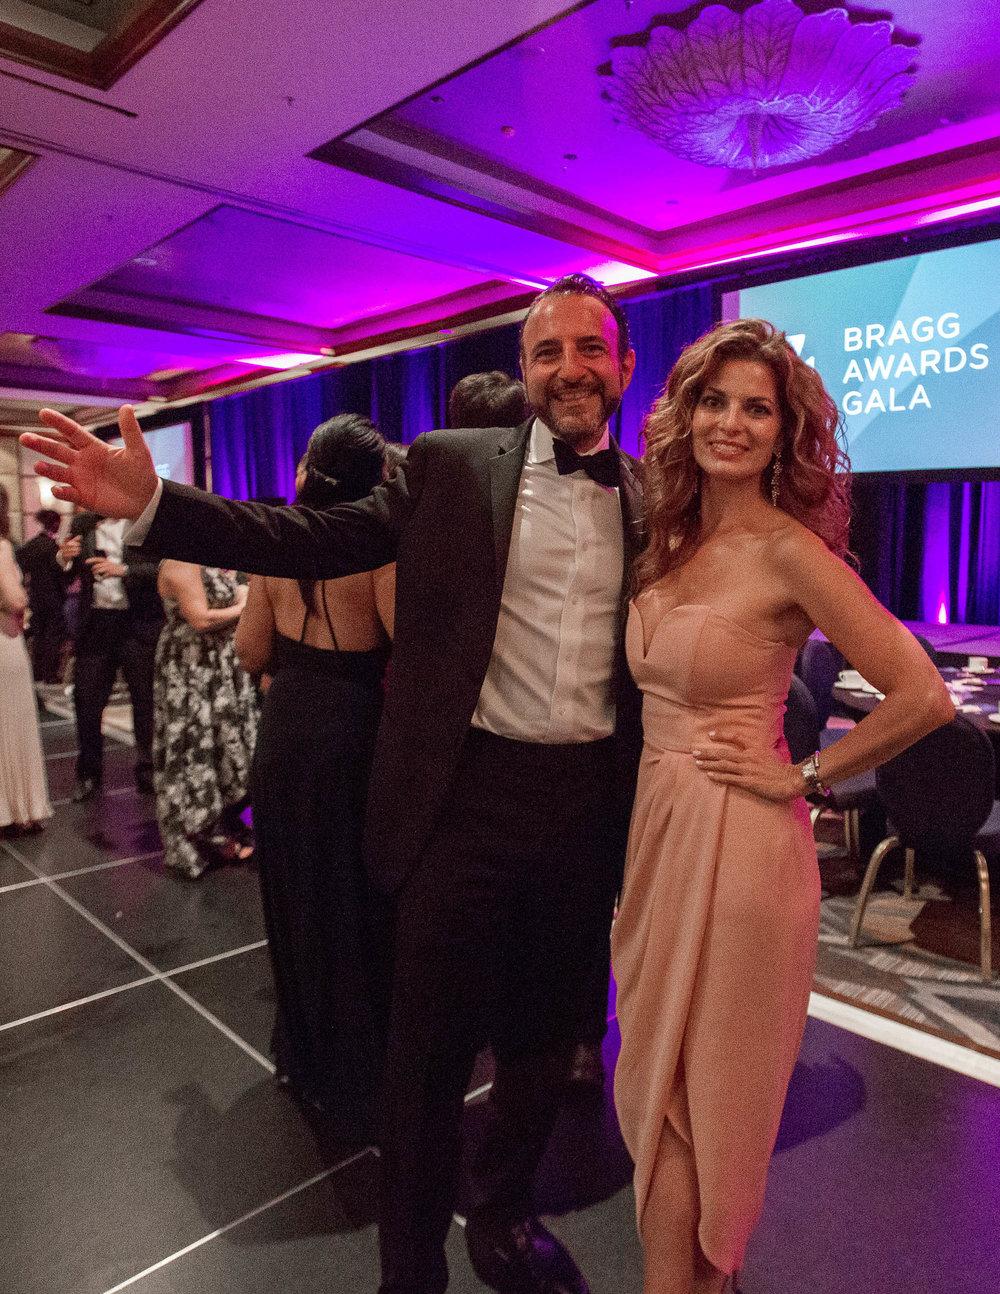 Bragg-Awards-2018-137.jpg